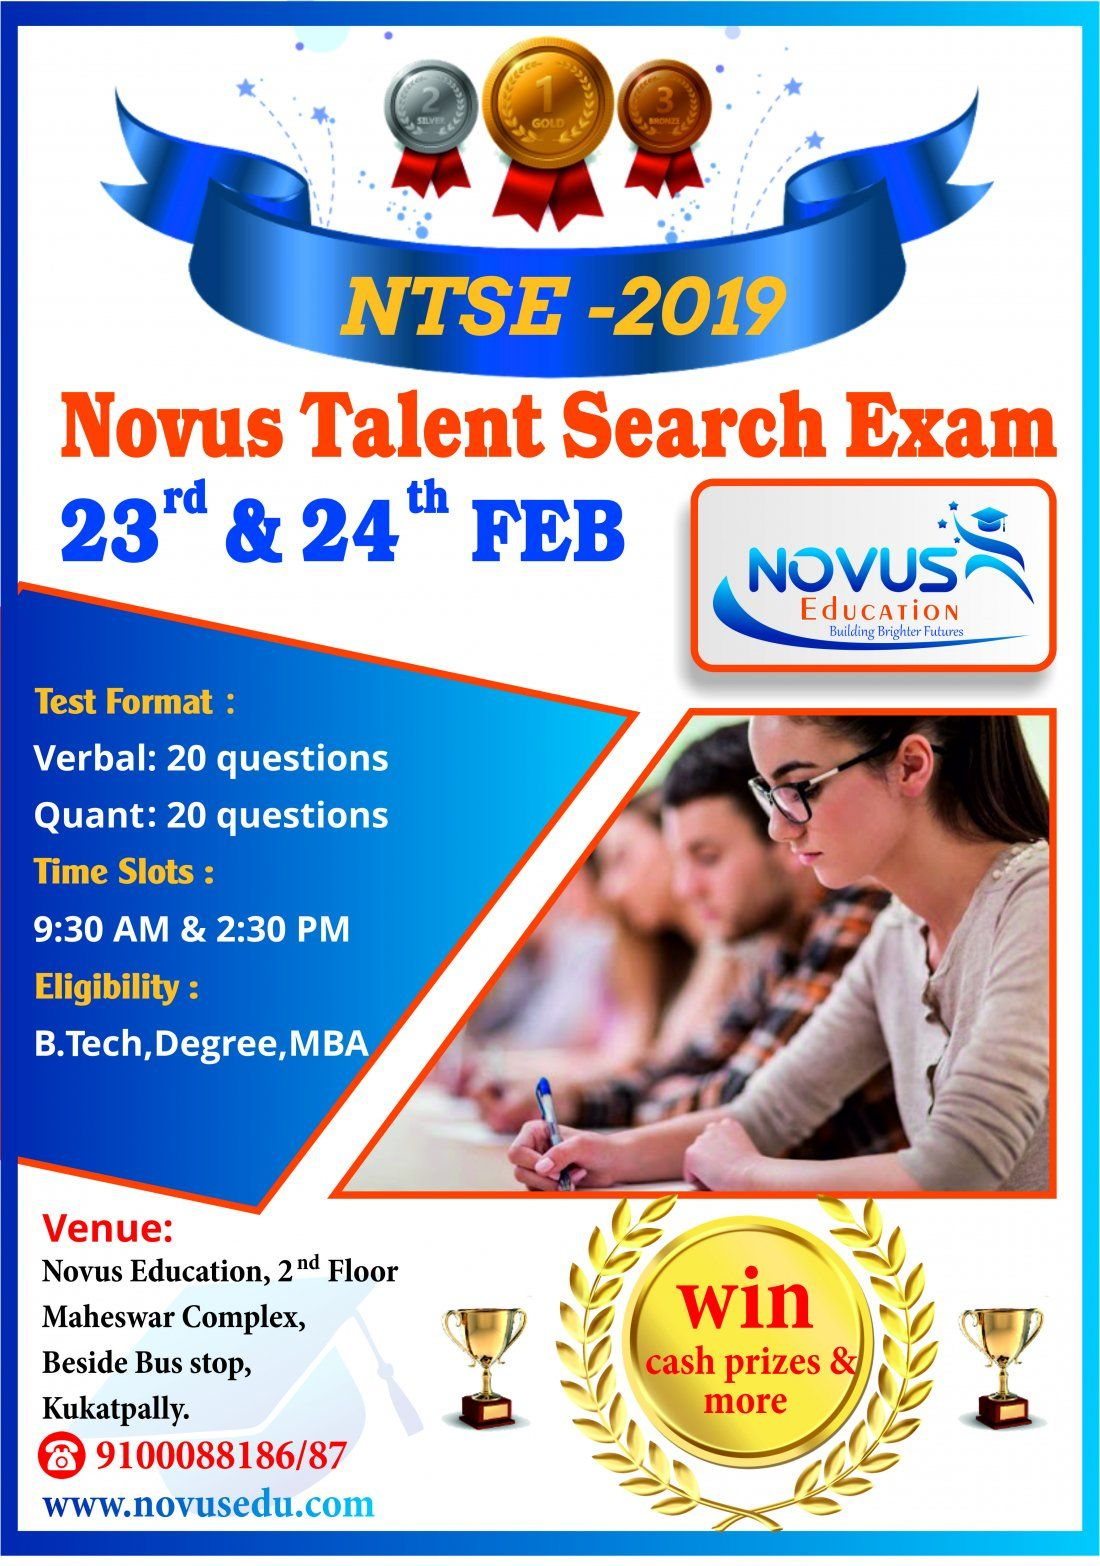 NTSE-2019(Novus Talent Search Exam)